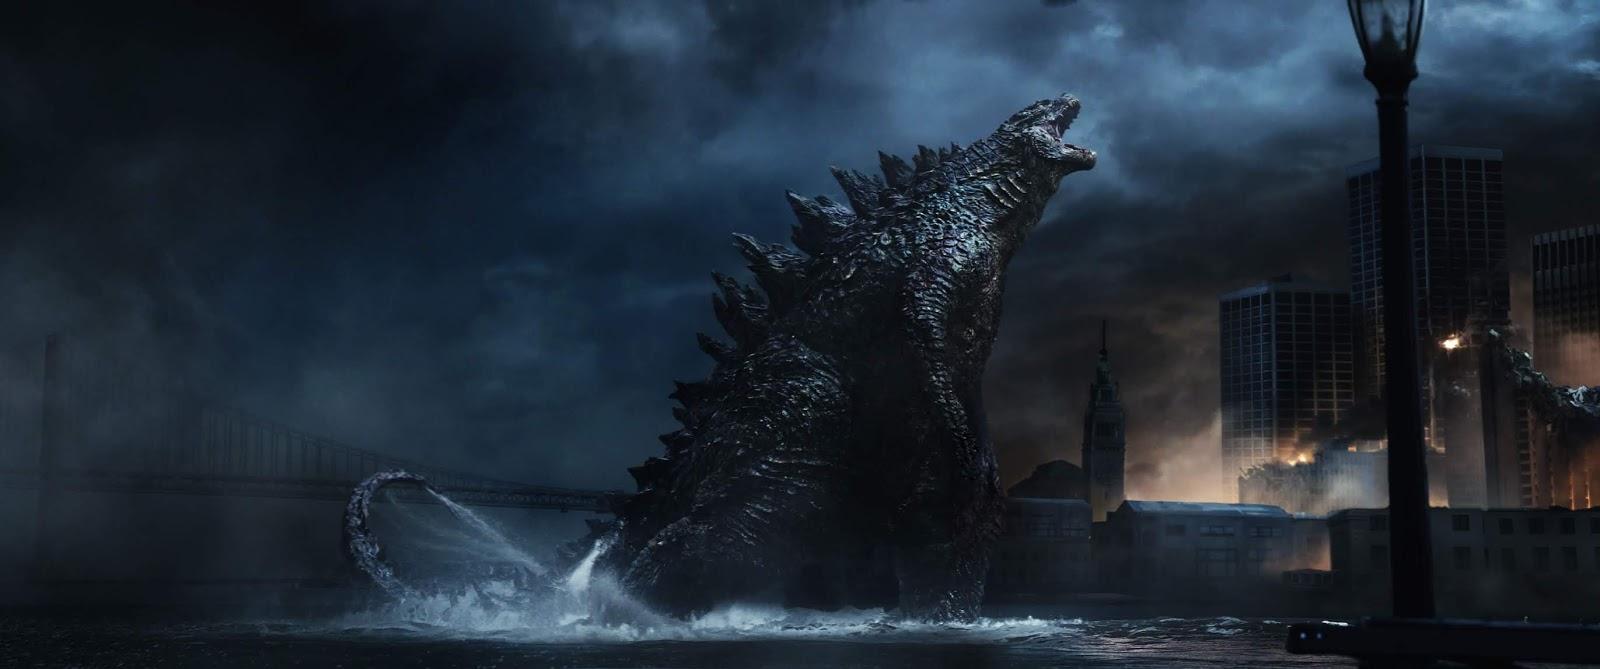 Movie Musings: Godzilla (2014)